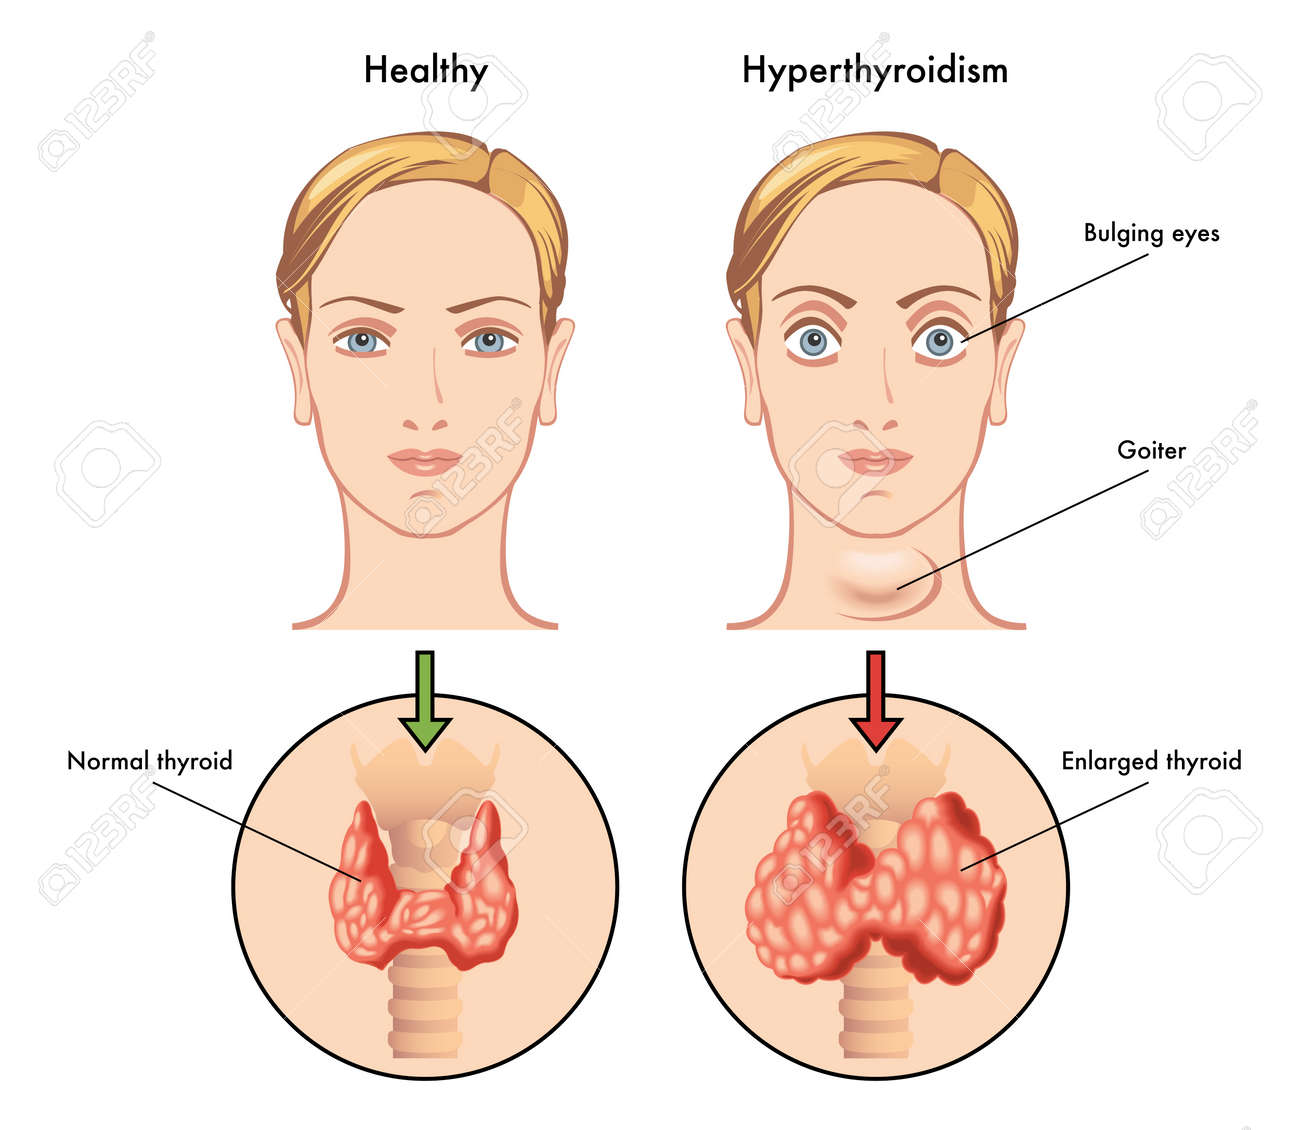 hyperthyroidism - 32875081